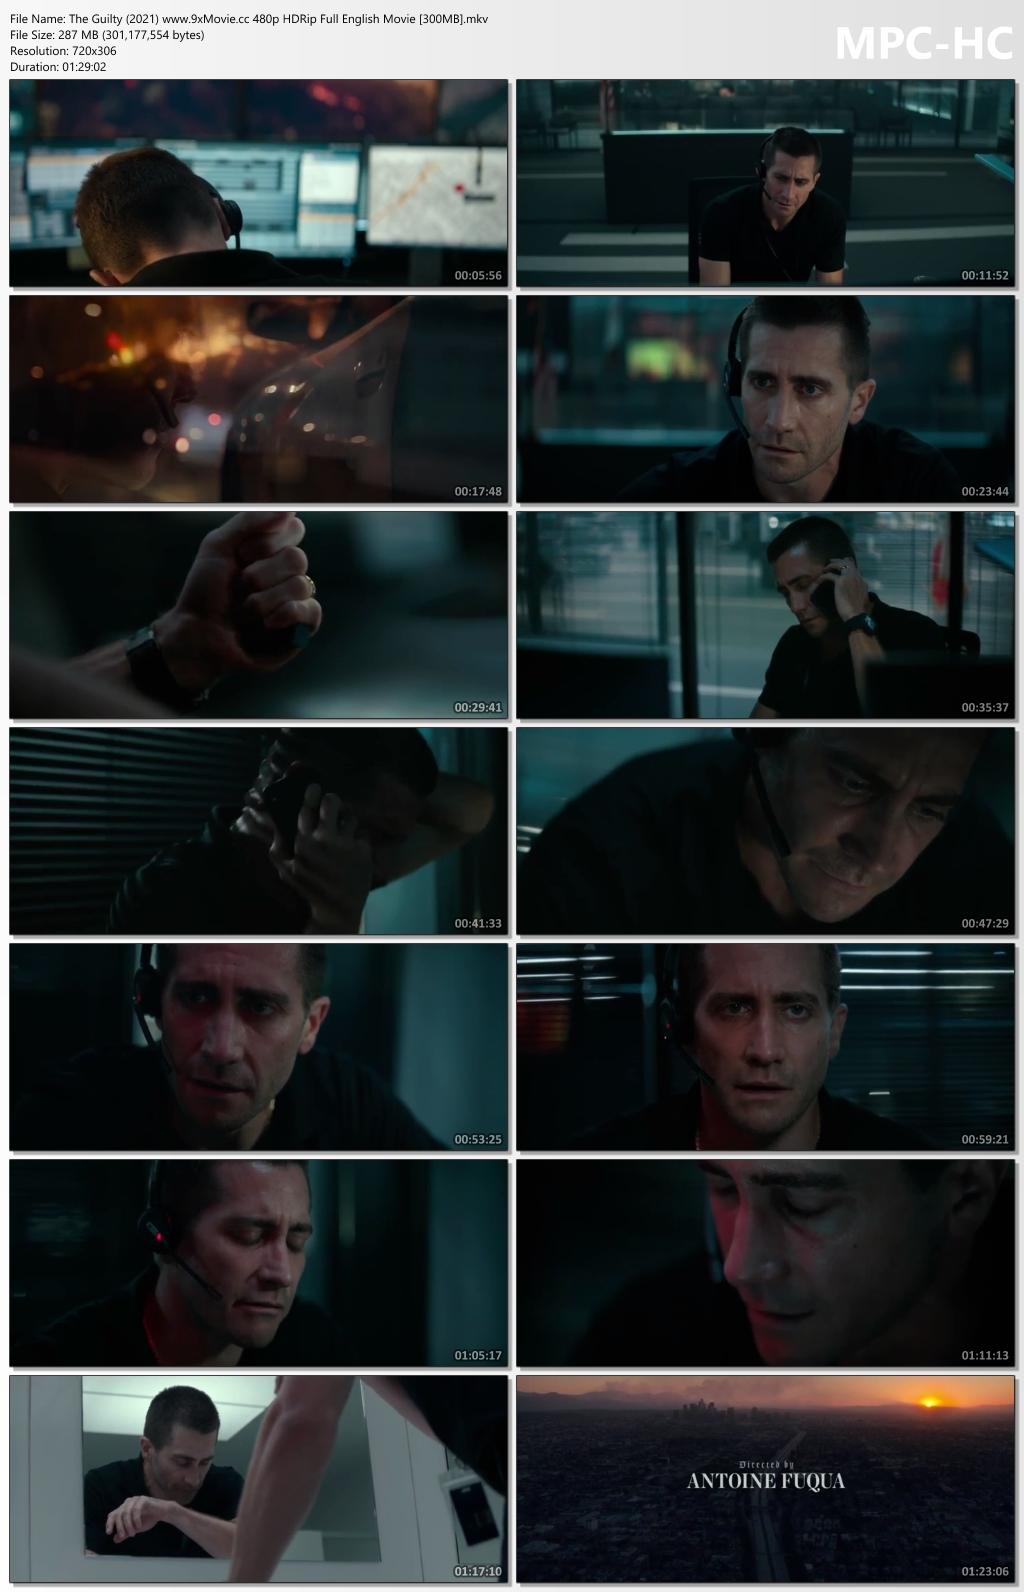 The-Guilty-2021-www-9x-Movie-cc-480p-HDRip-Full-English-Movie-300-MB-mkv